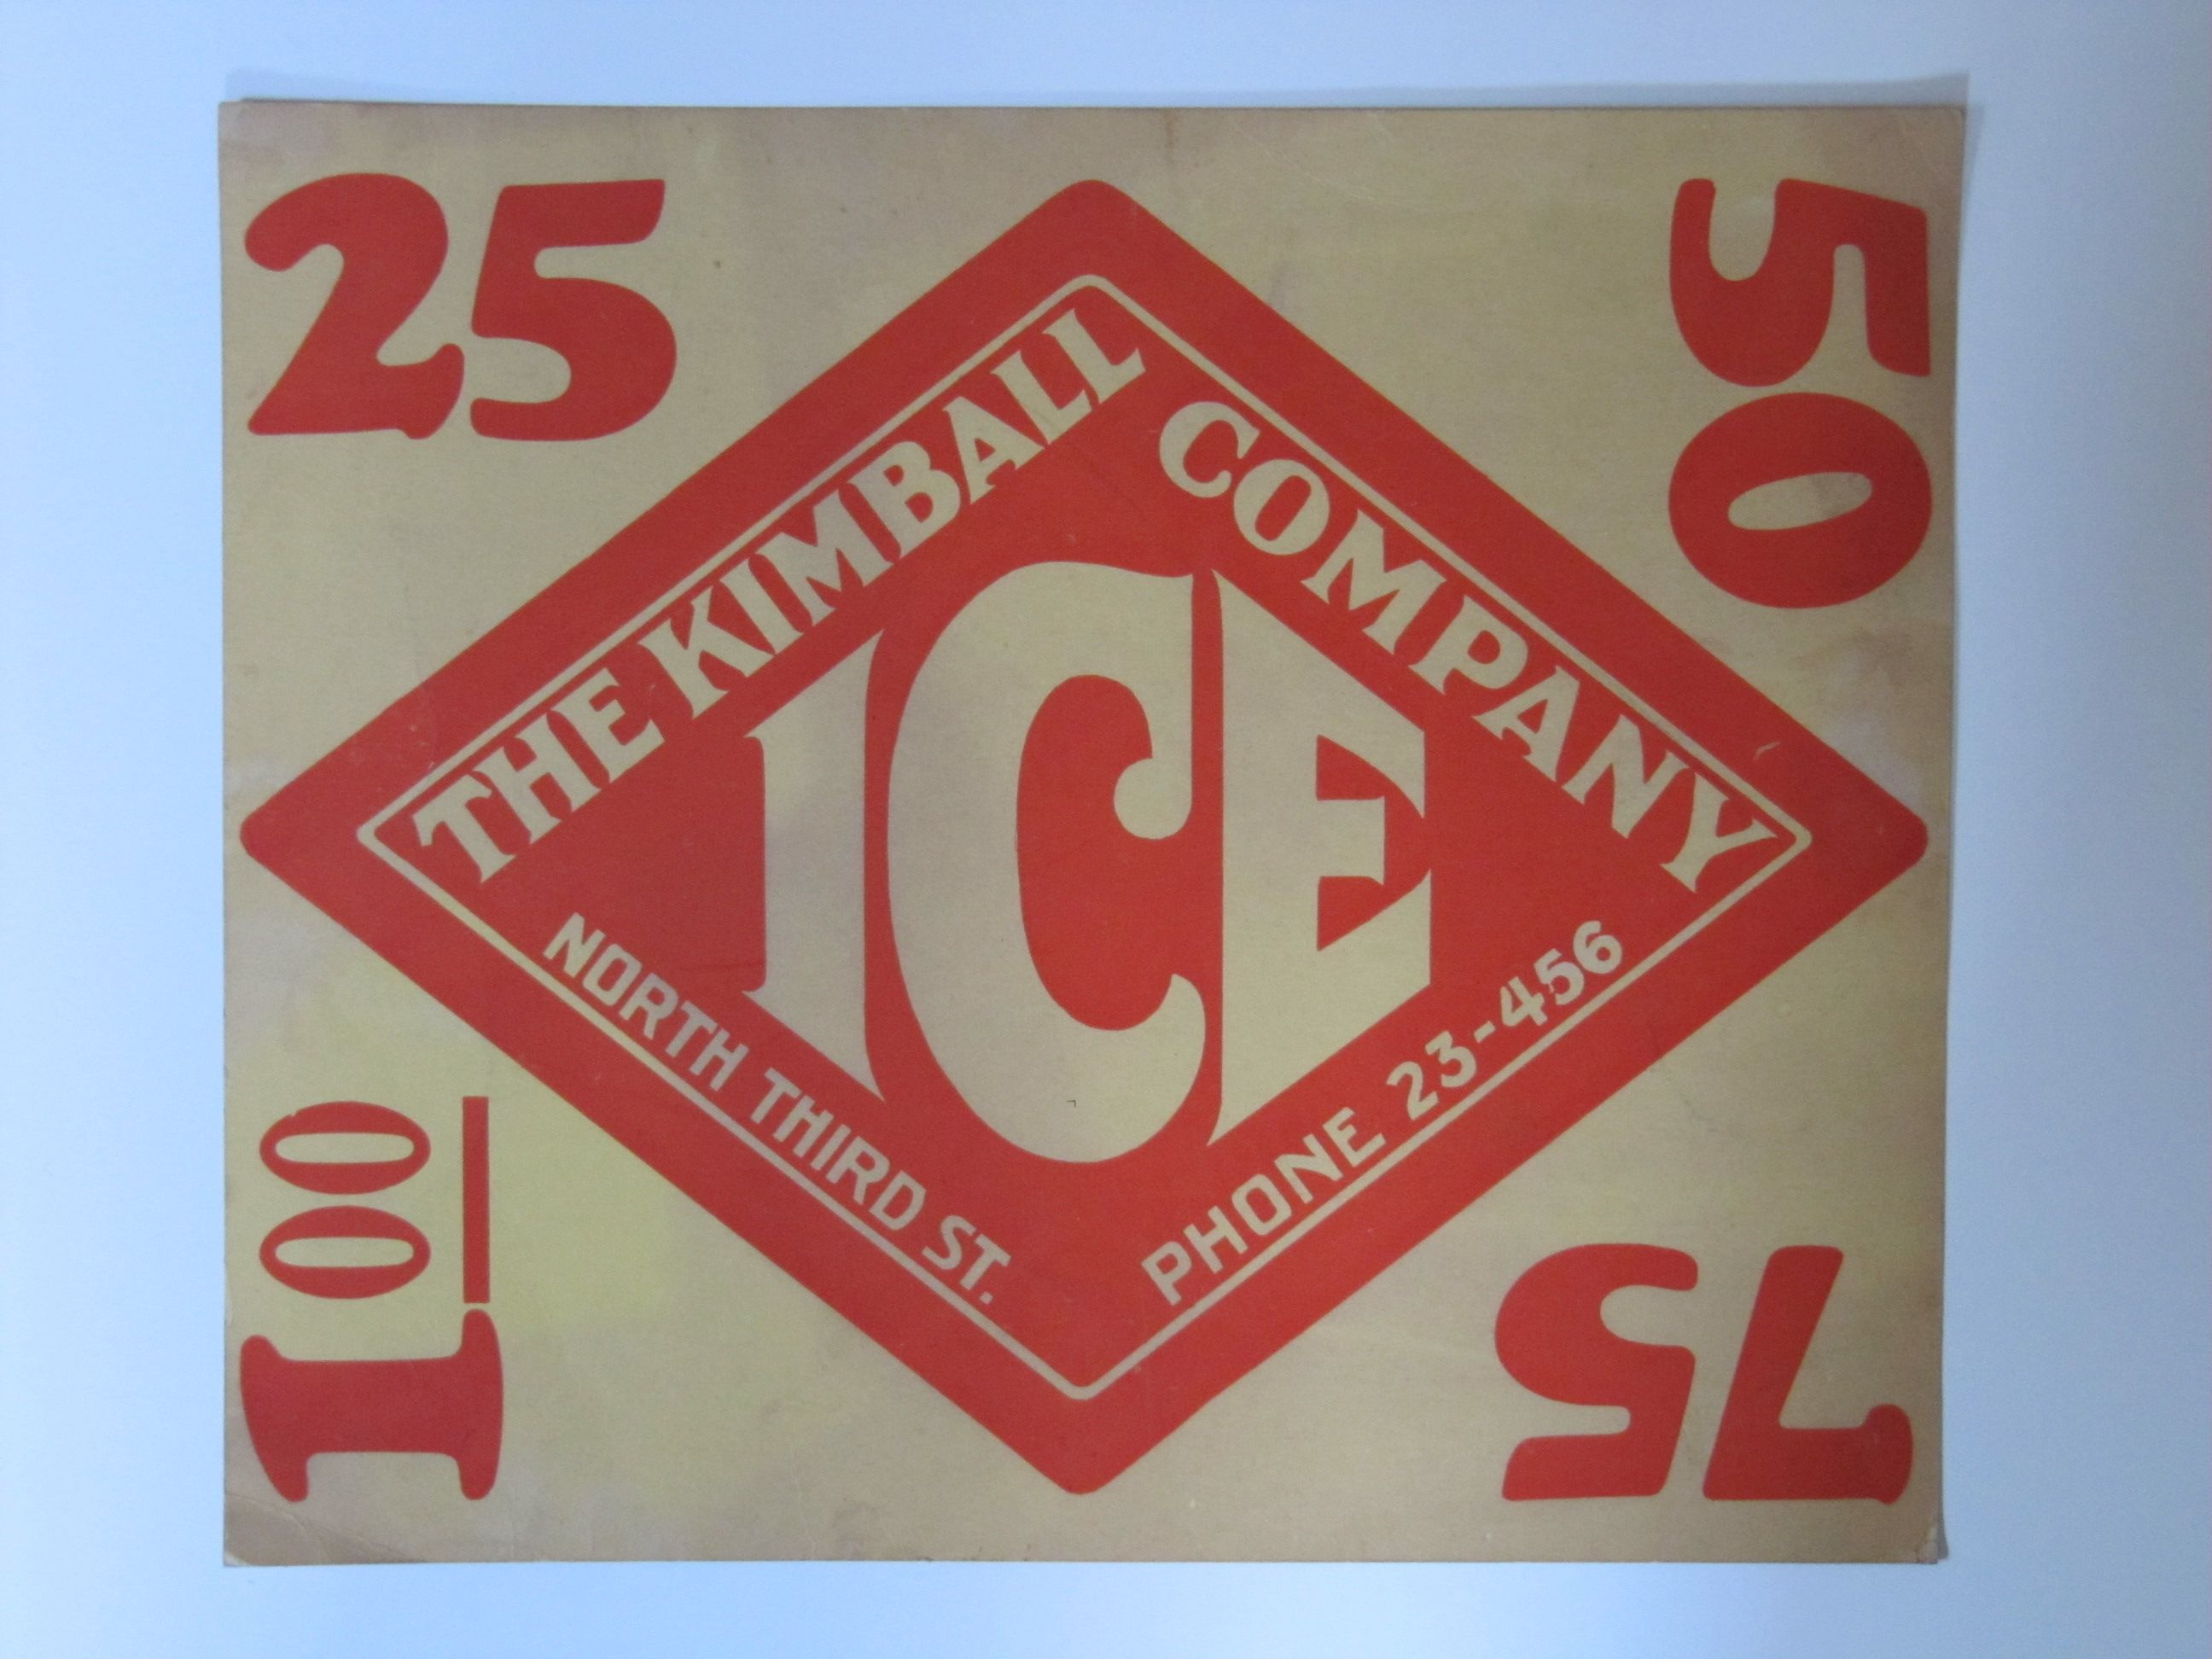 Kimball Company